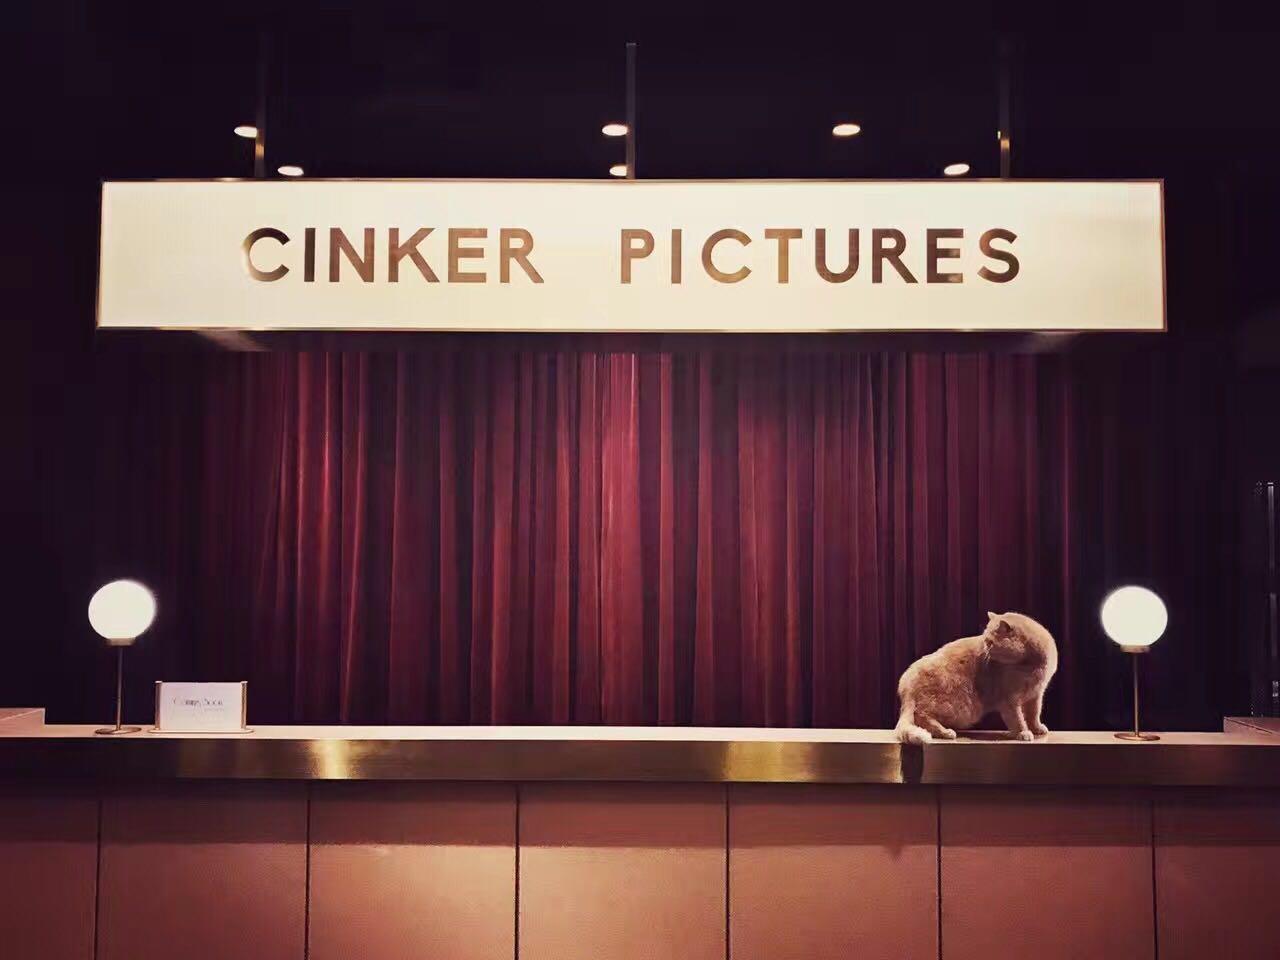 pictures cinker cinema